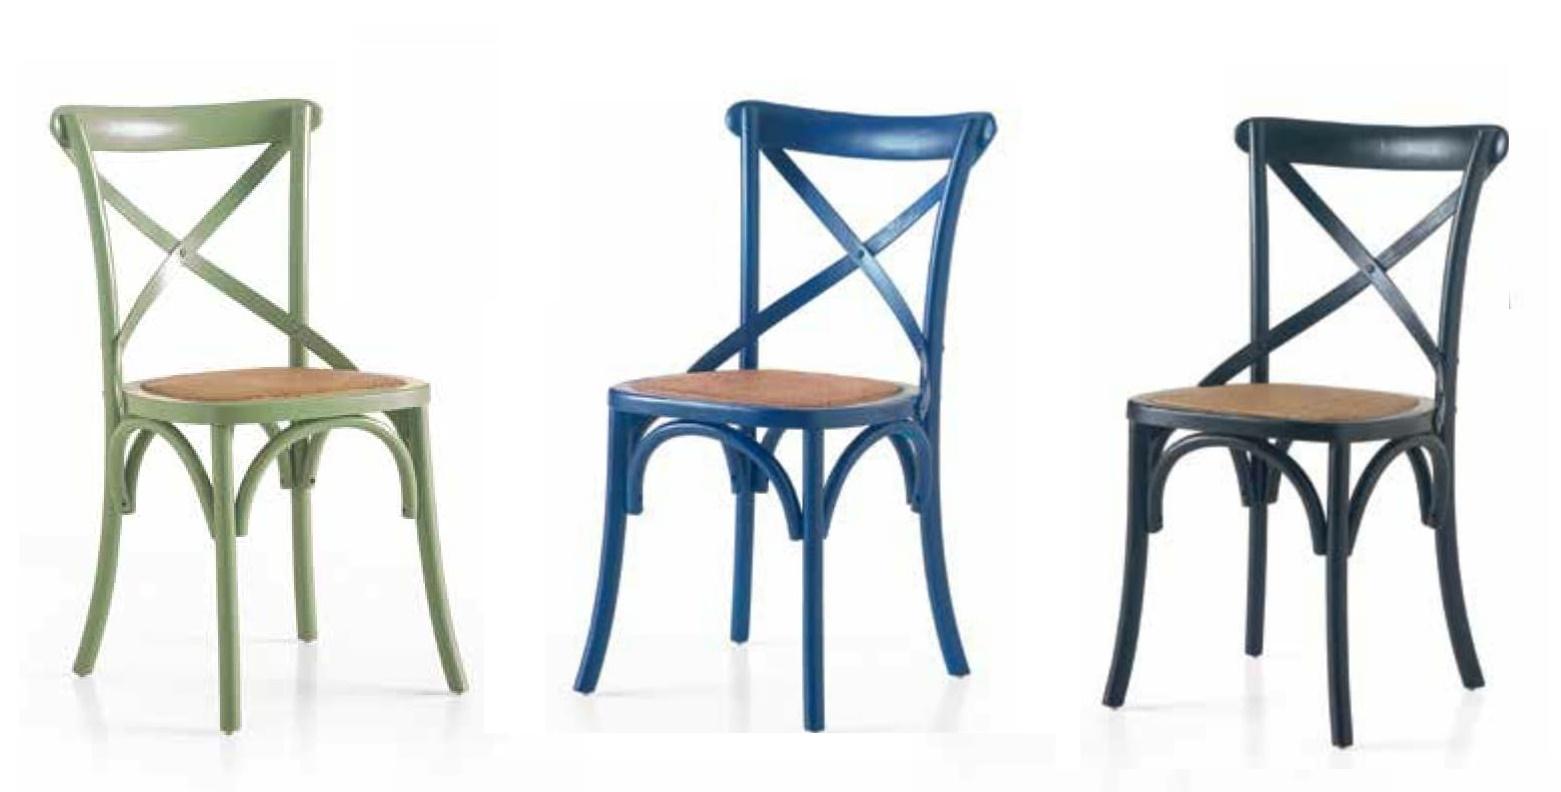 Sedia in olmo laccata seduta rattan naturale sedie a for Sedia e maschile o femminile